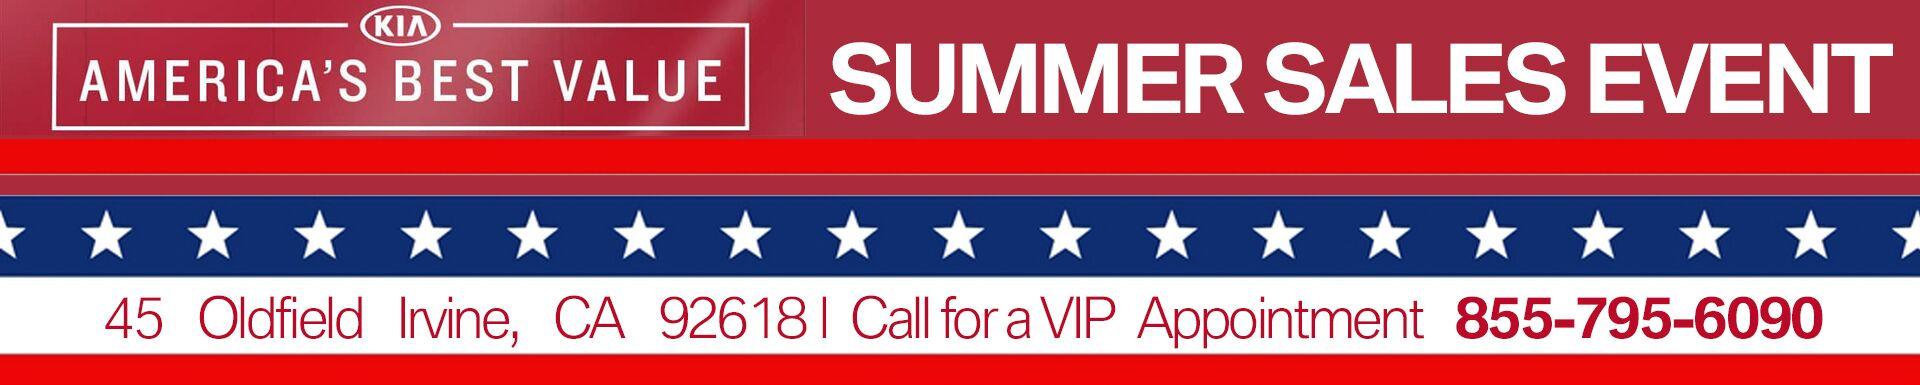 Kia Of Irvine Summer Sales Event Orange County